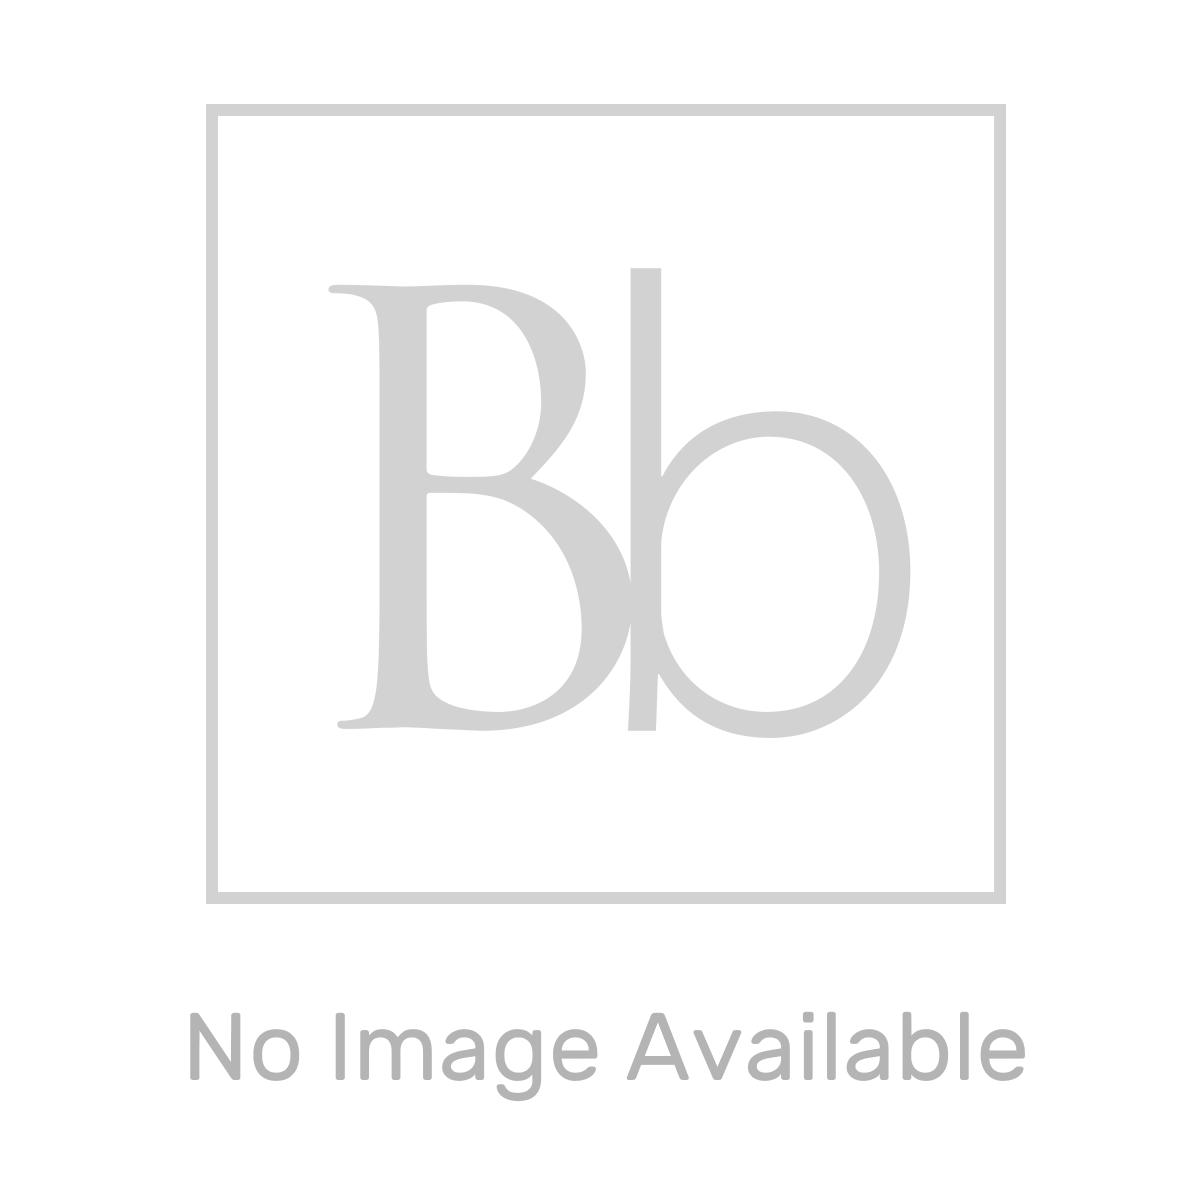 Nuie Athena Gloss Grey 2 Door Floor Standing Vanity Unit with 18mm Profile Basin 500mm Line Drawing